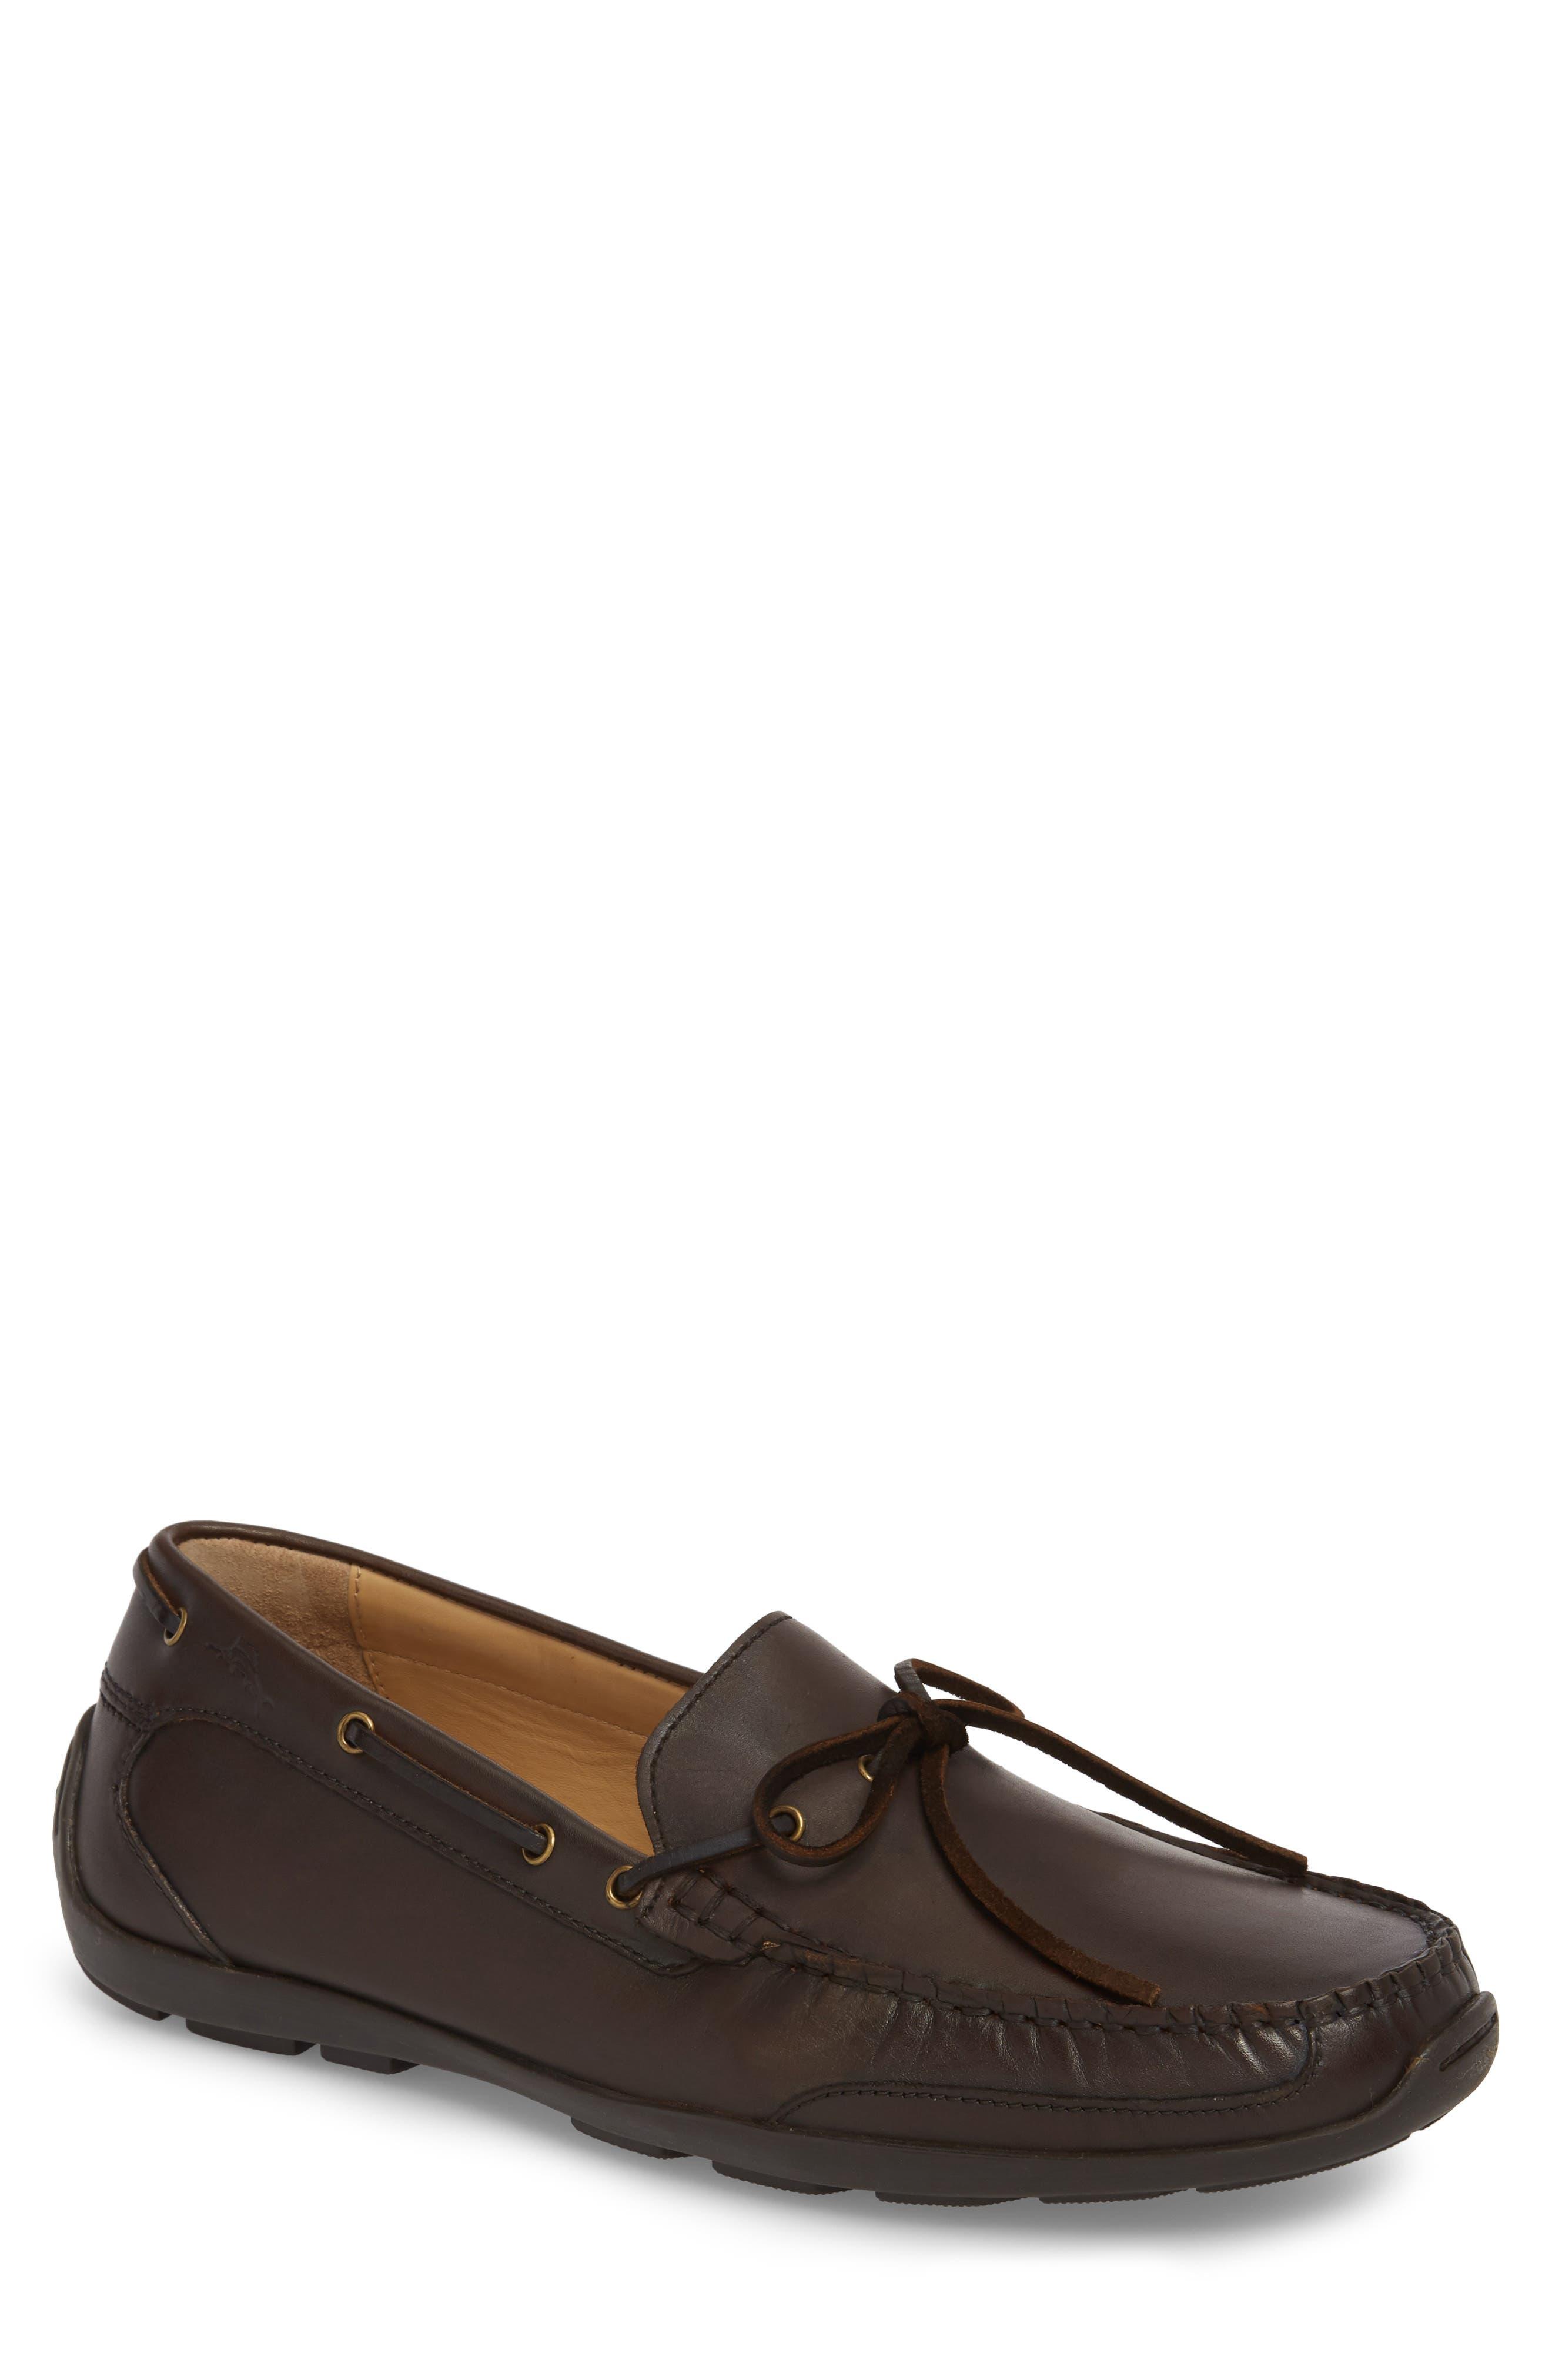 Tangier Driving Shoe,                             Main thumbnail 1, color,                             Medium Brown Leather